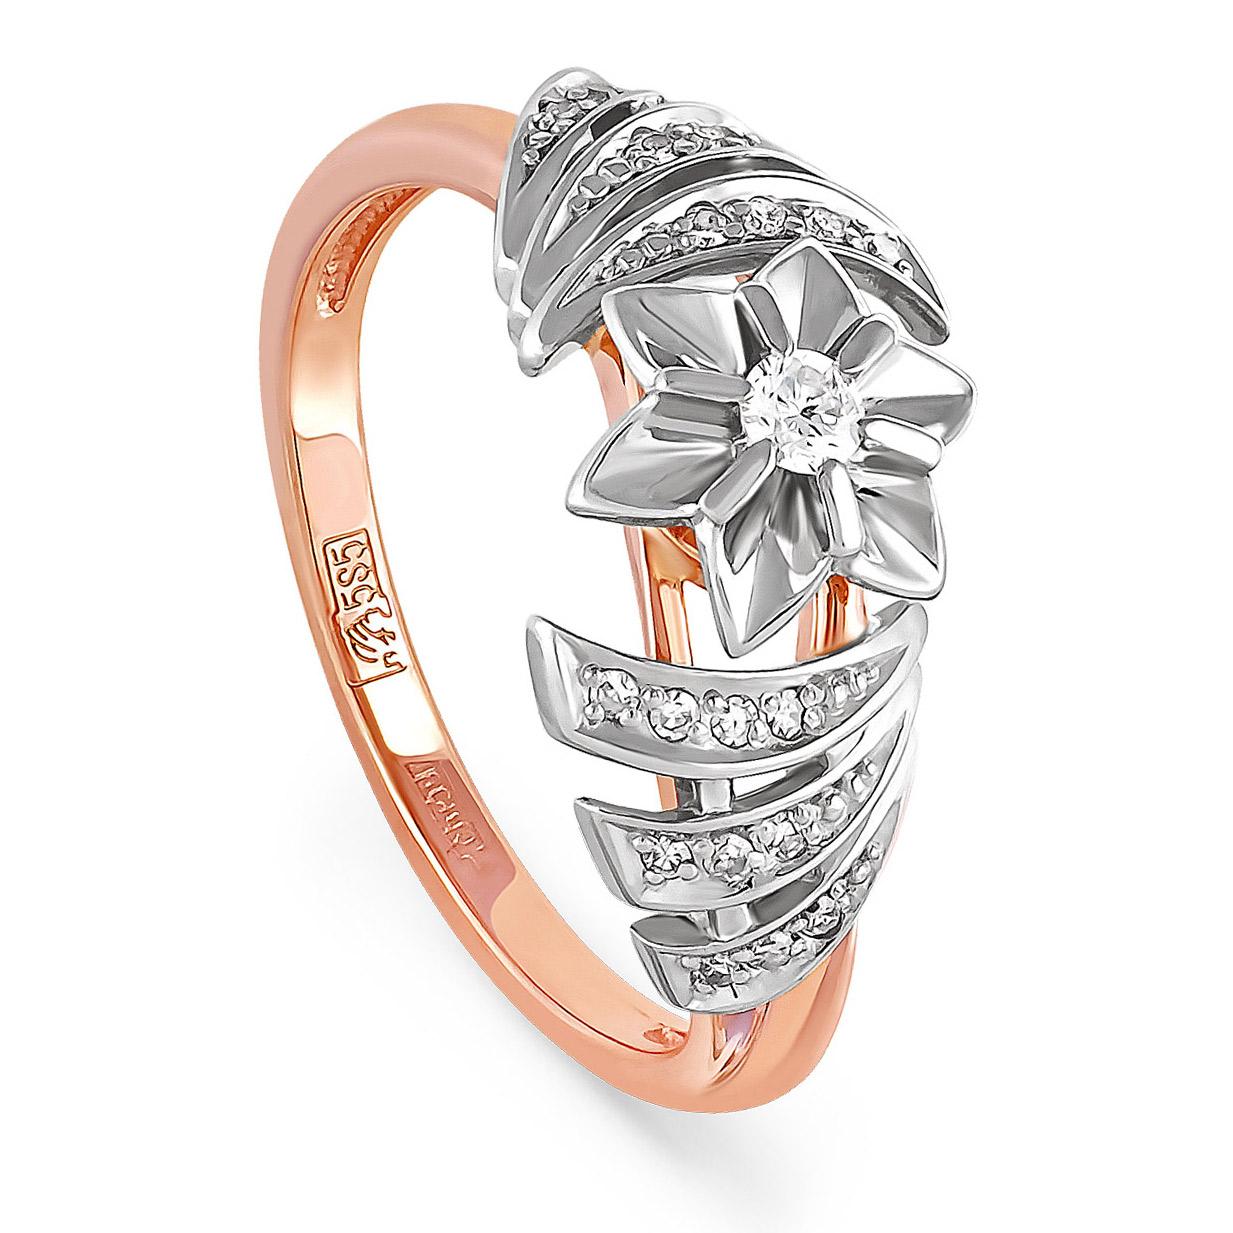 Золотое кольцо Бриллиант арт. 11-0344 11-0344